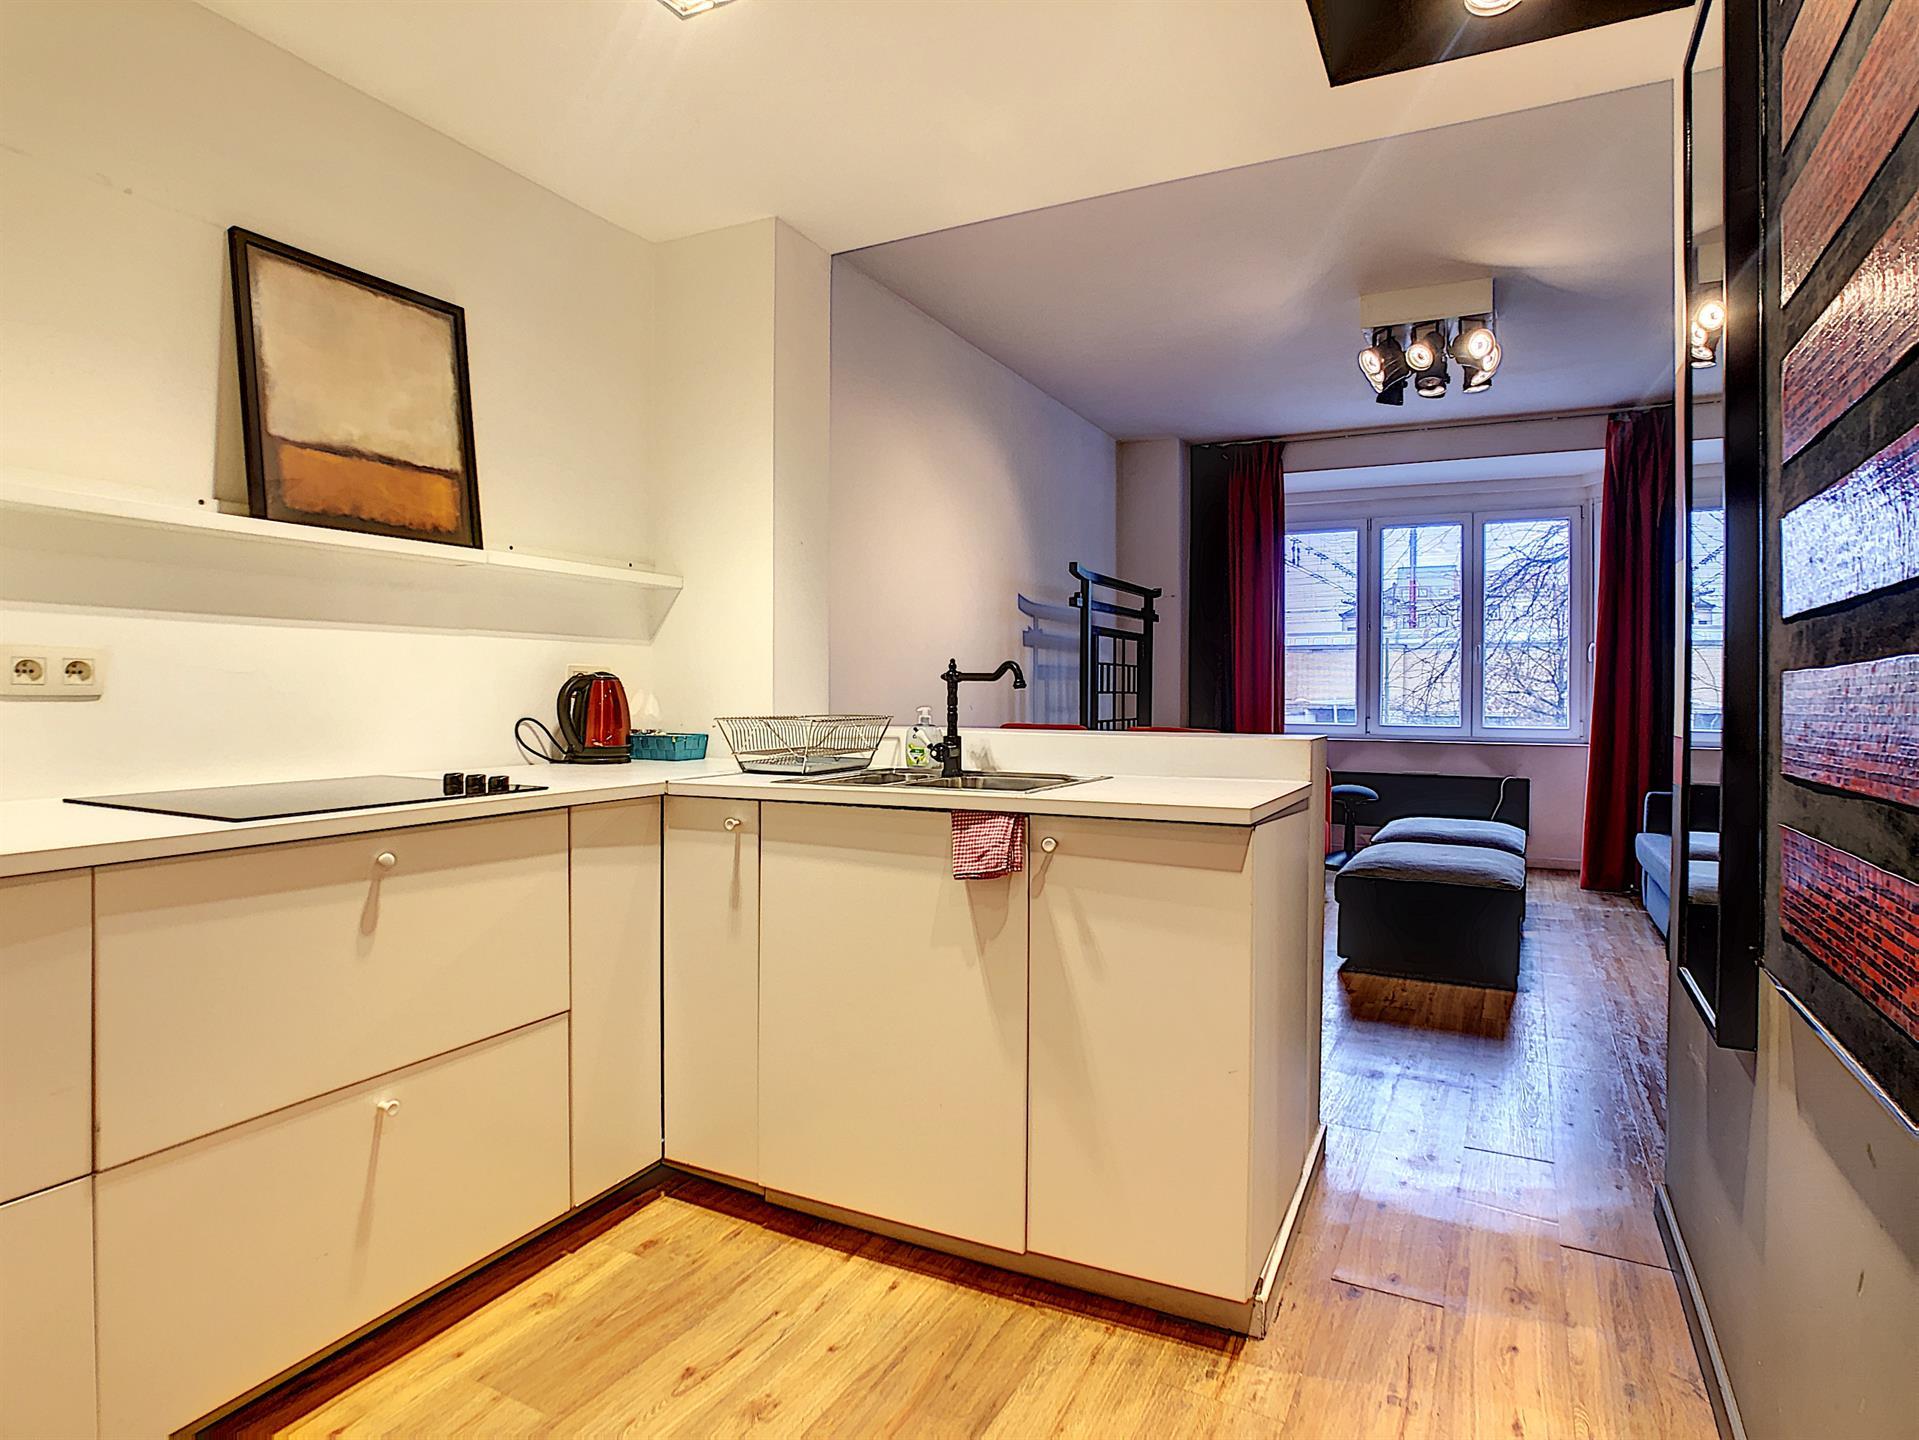 Appartement - Sint-Gillis - #4236948-1